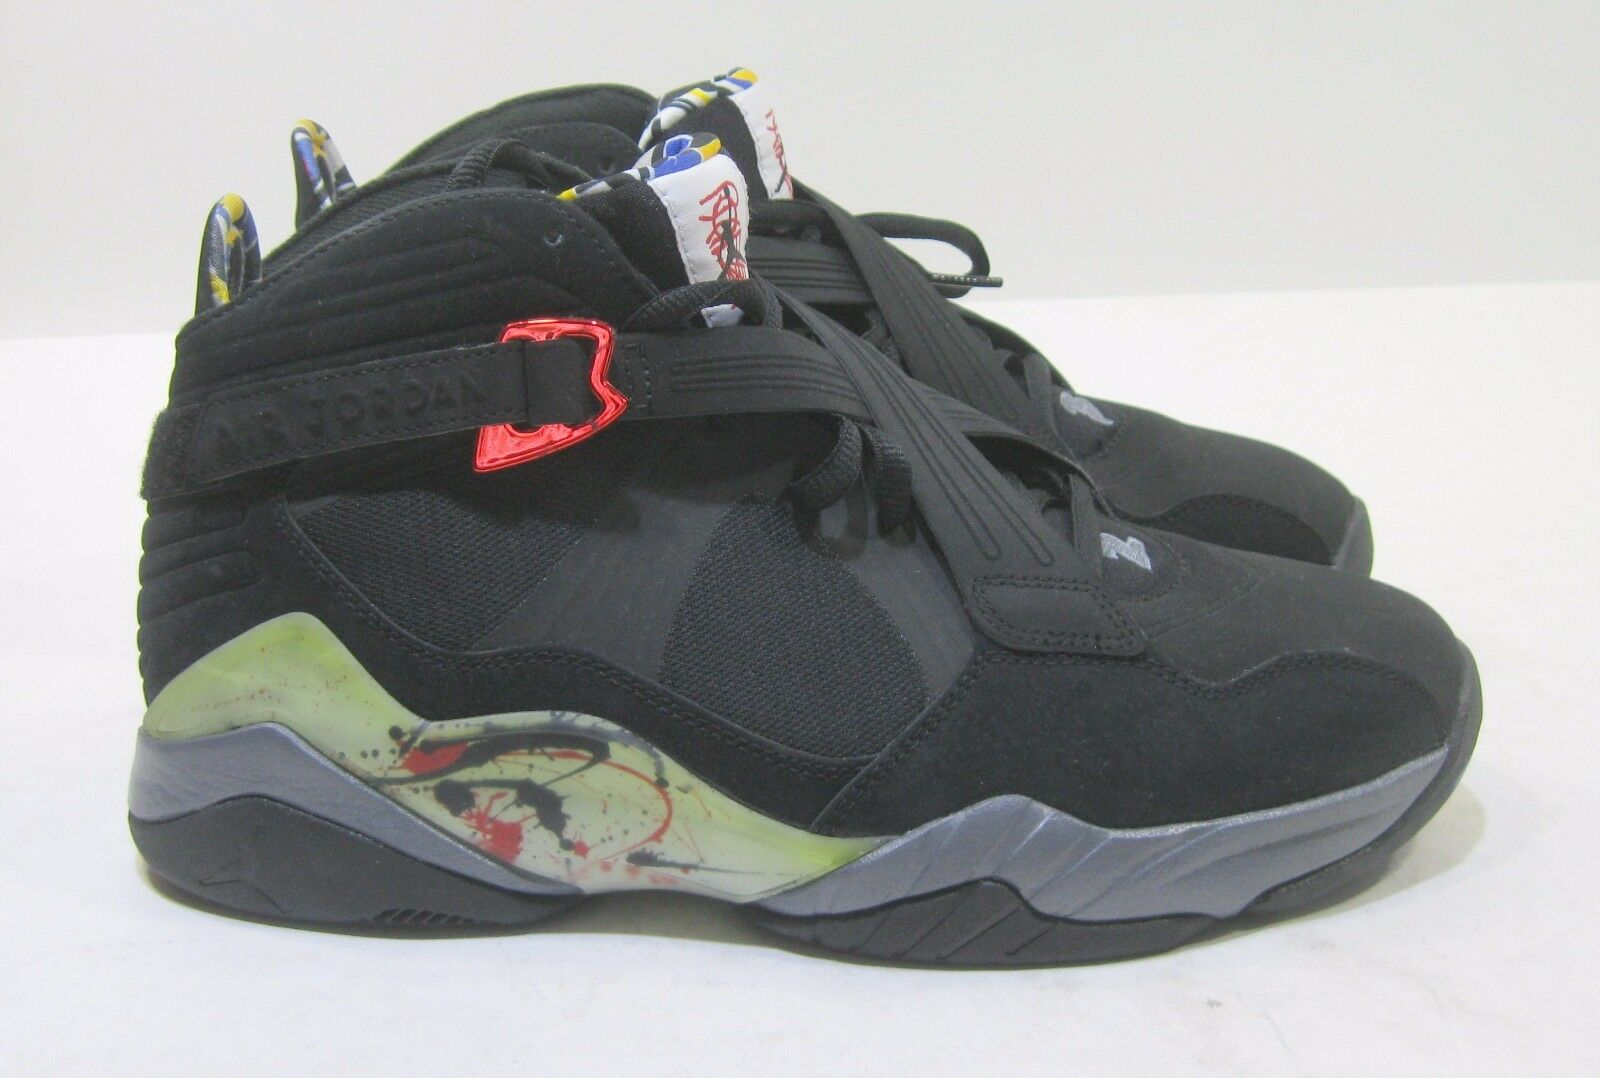 New  Air Jordan 8.0 467807 010 Black Varsity Red-Flint Grey 2011 Size 10.5